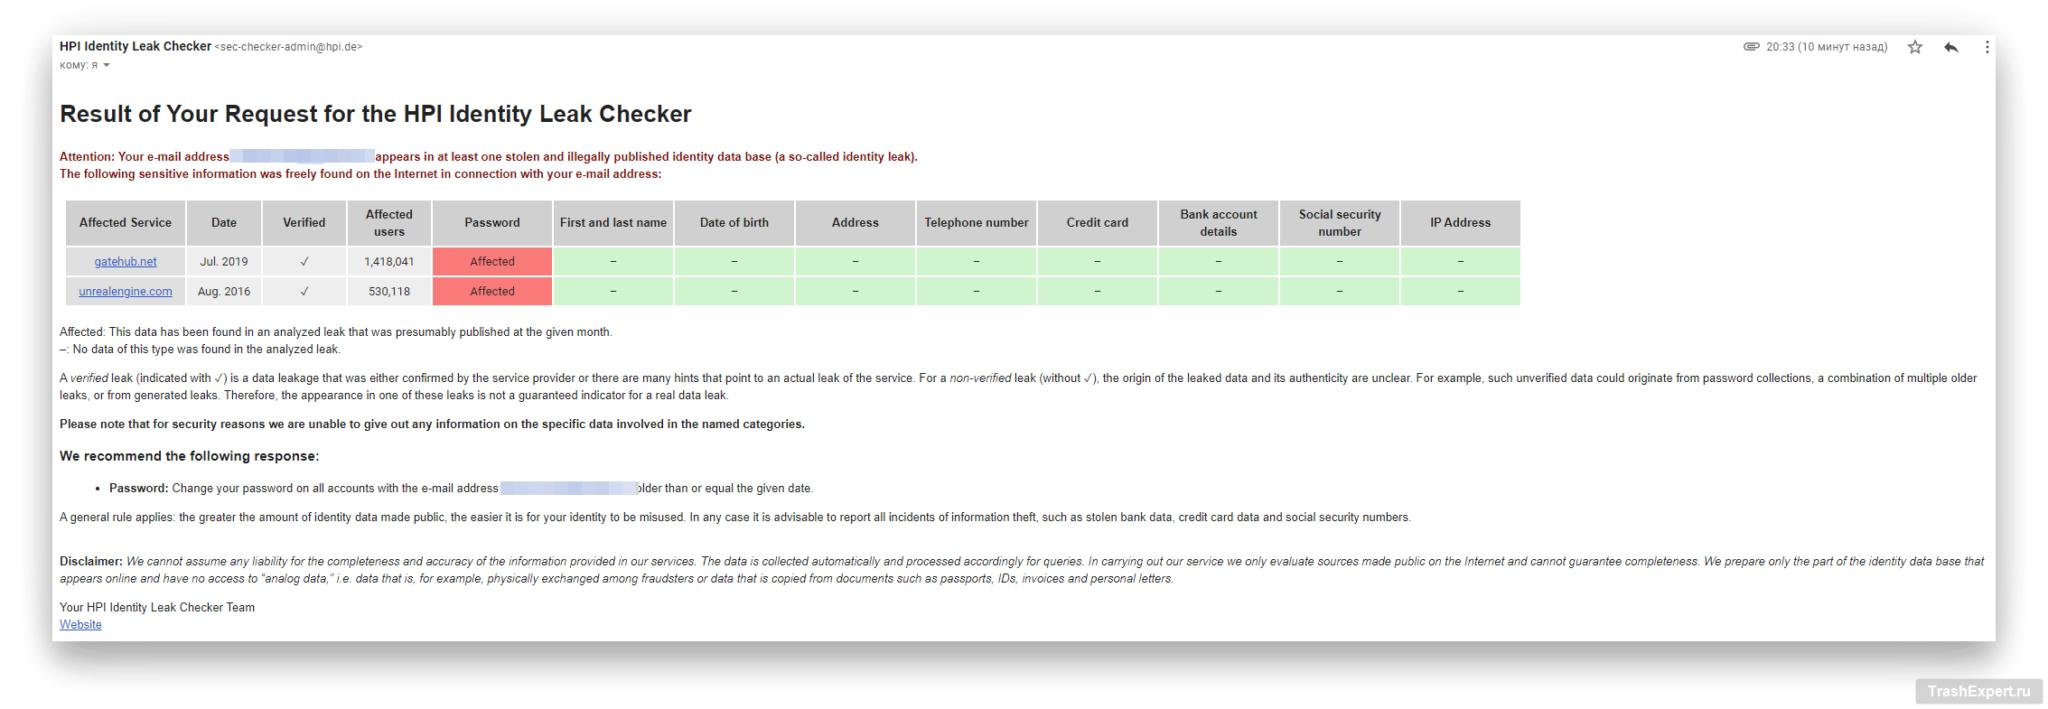 HPI Identity Leak Checker